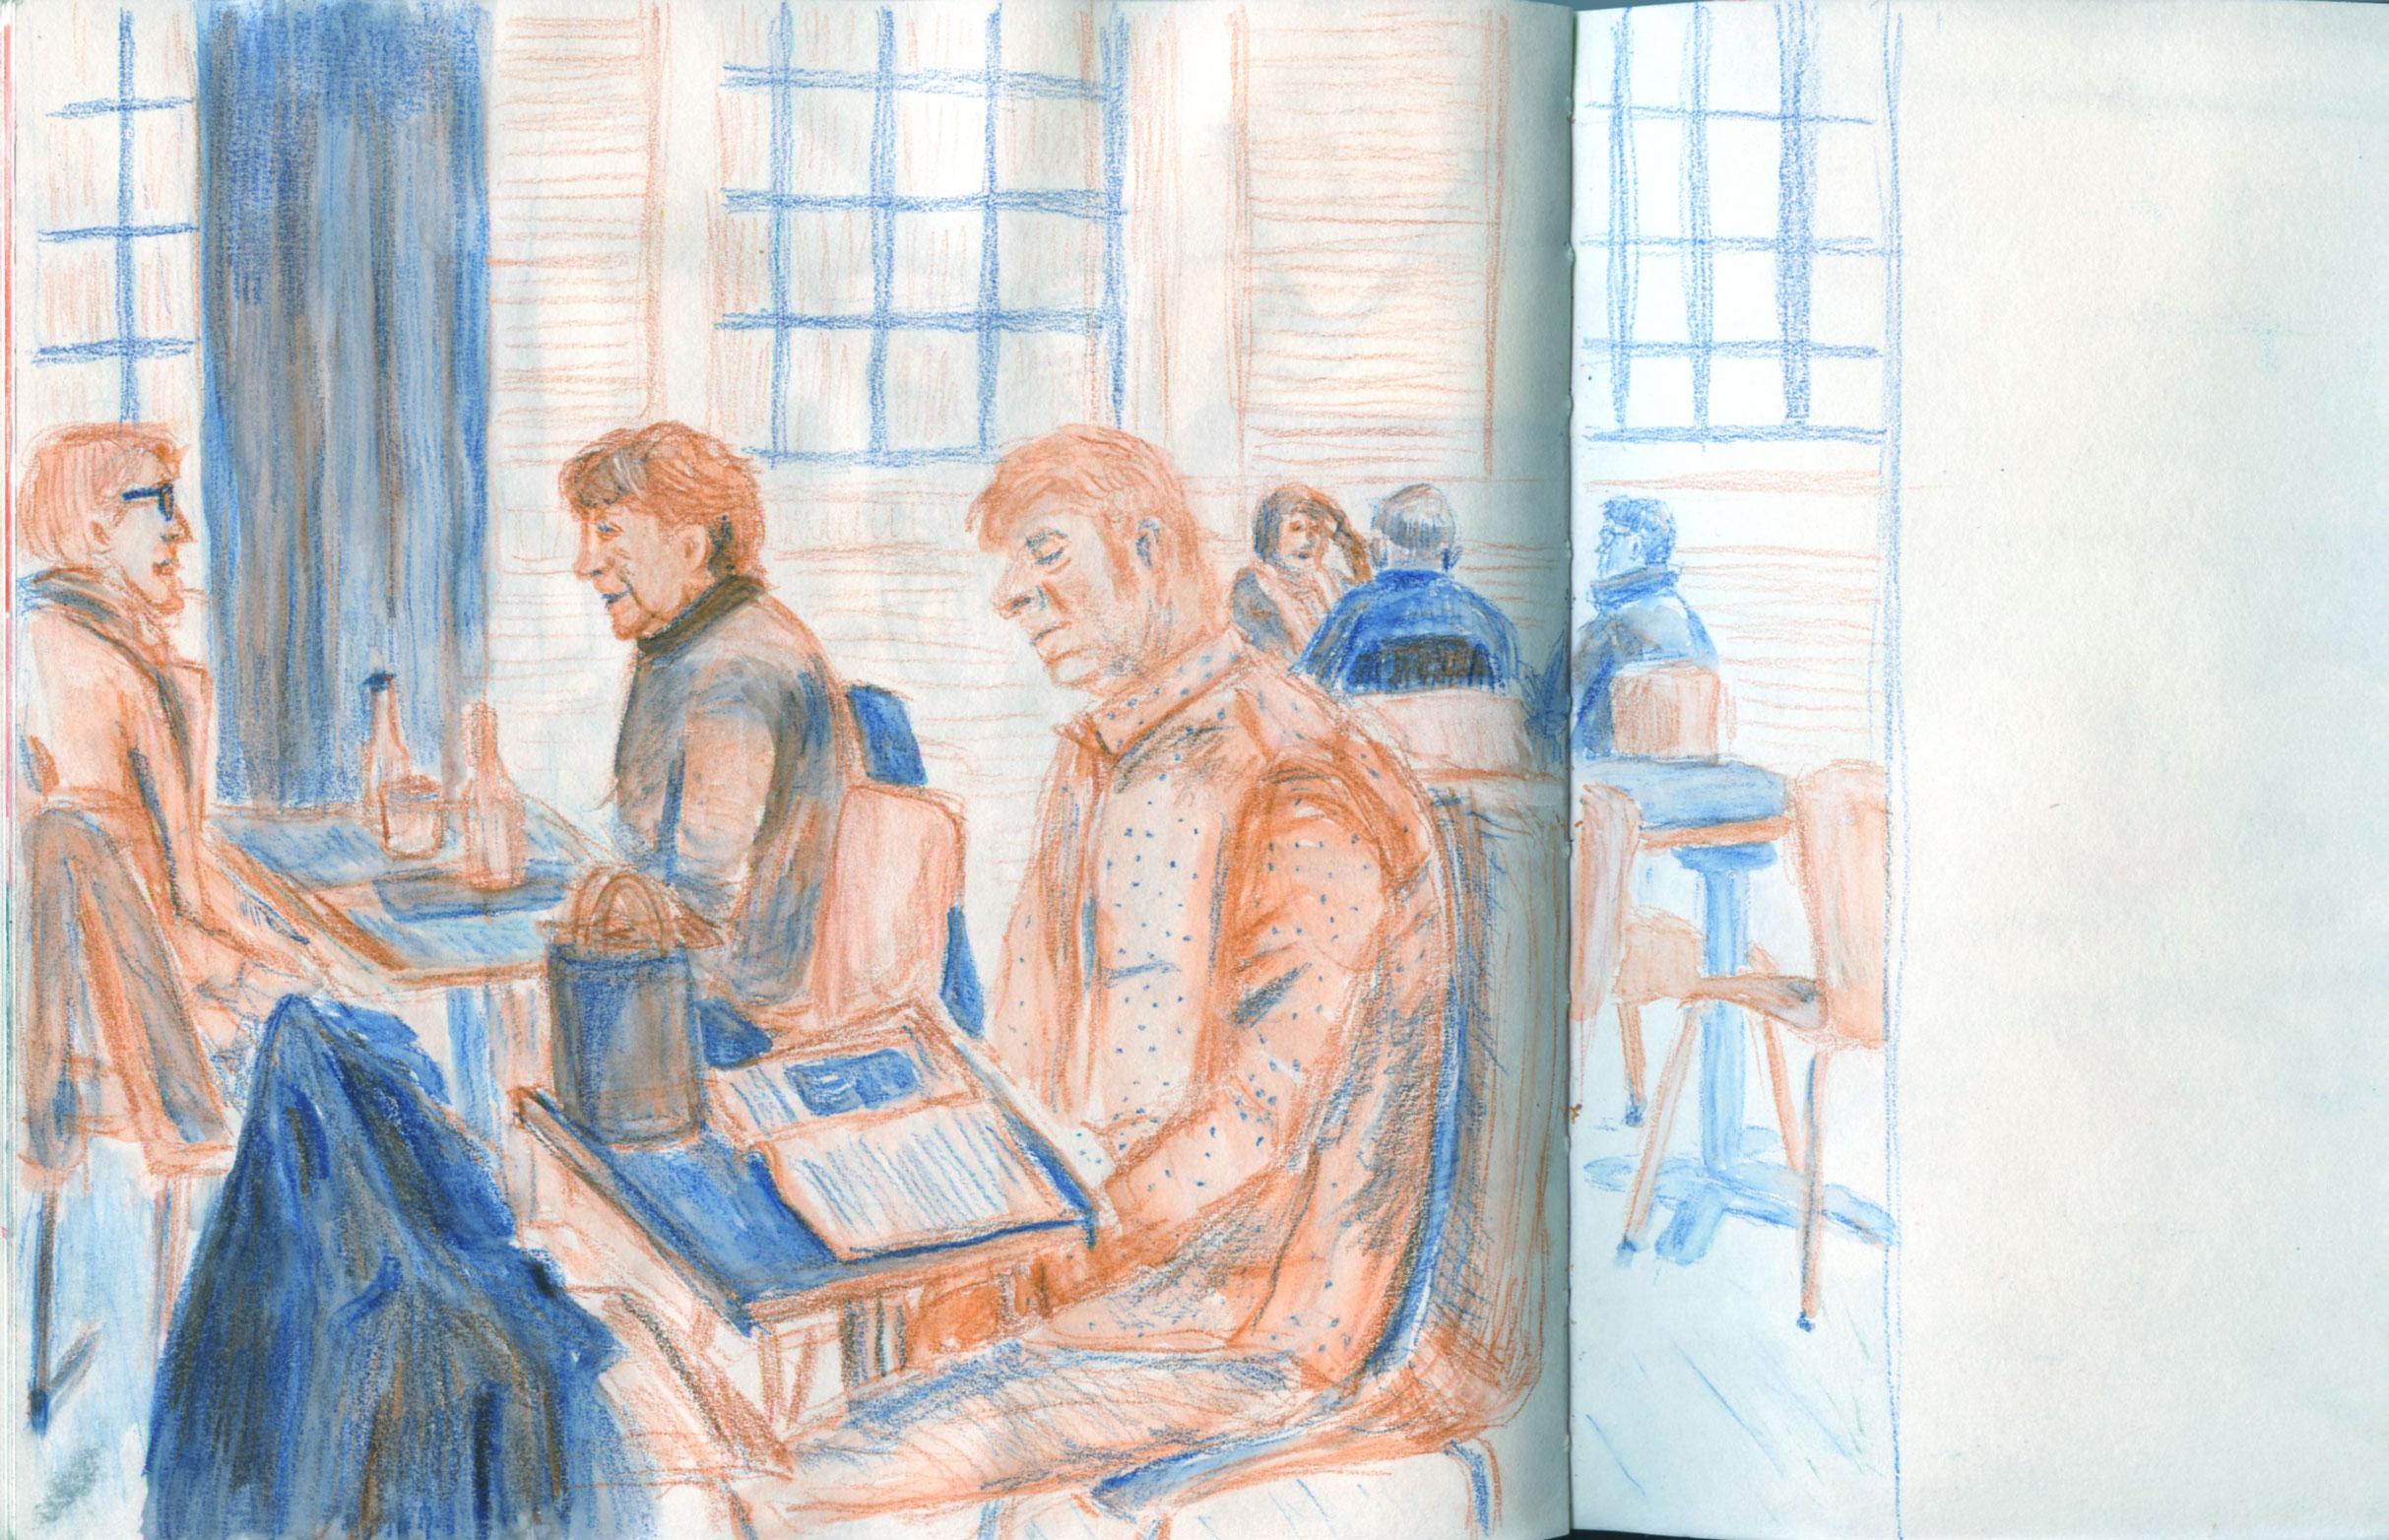 sketch at fitzwilliam museum by ellen vesters illustrator MA childrens book illustration